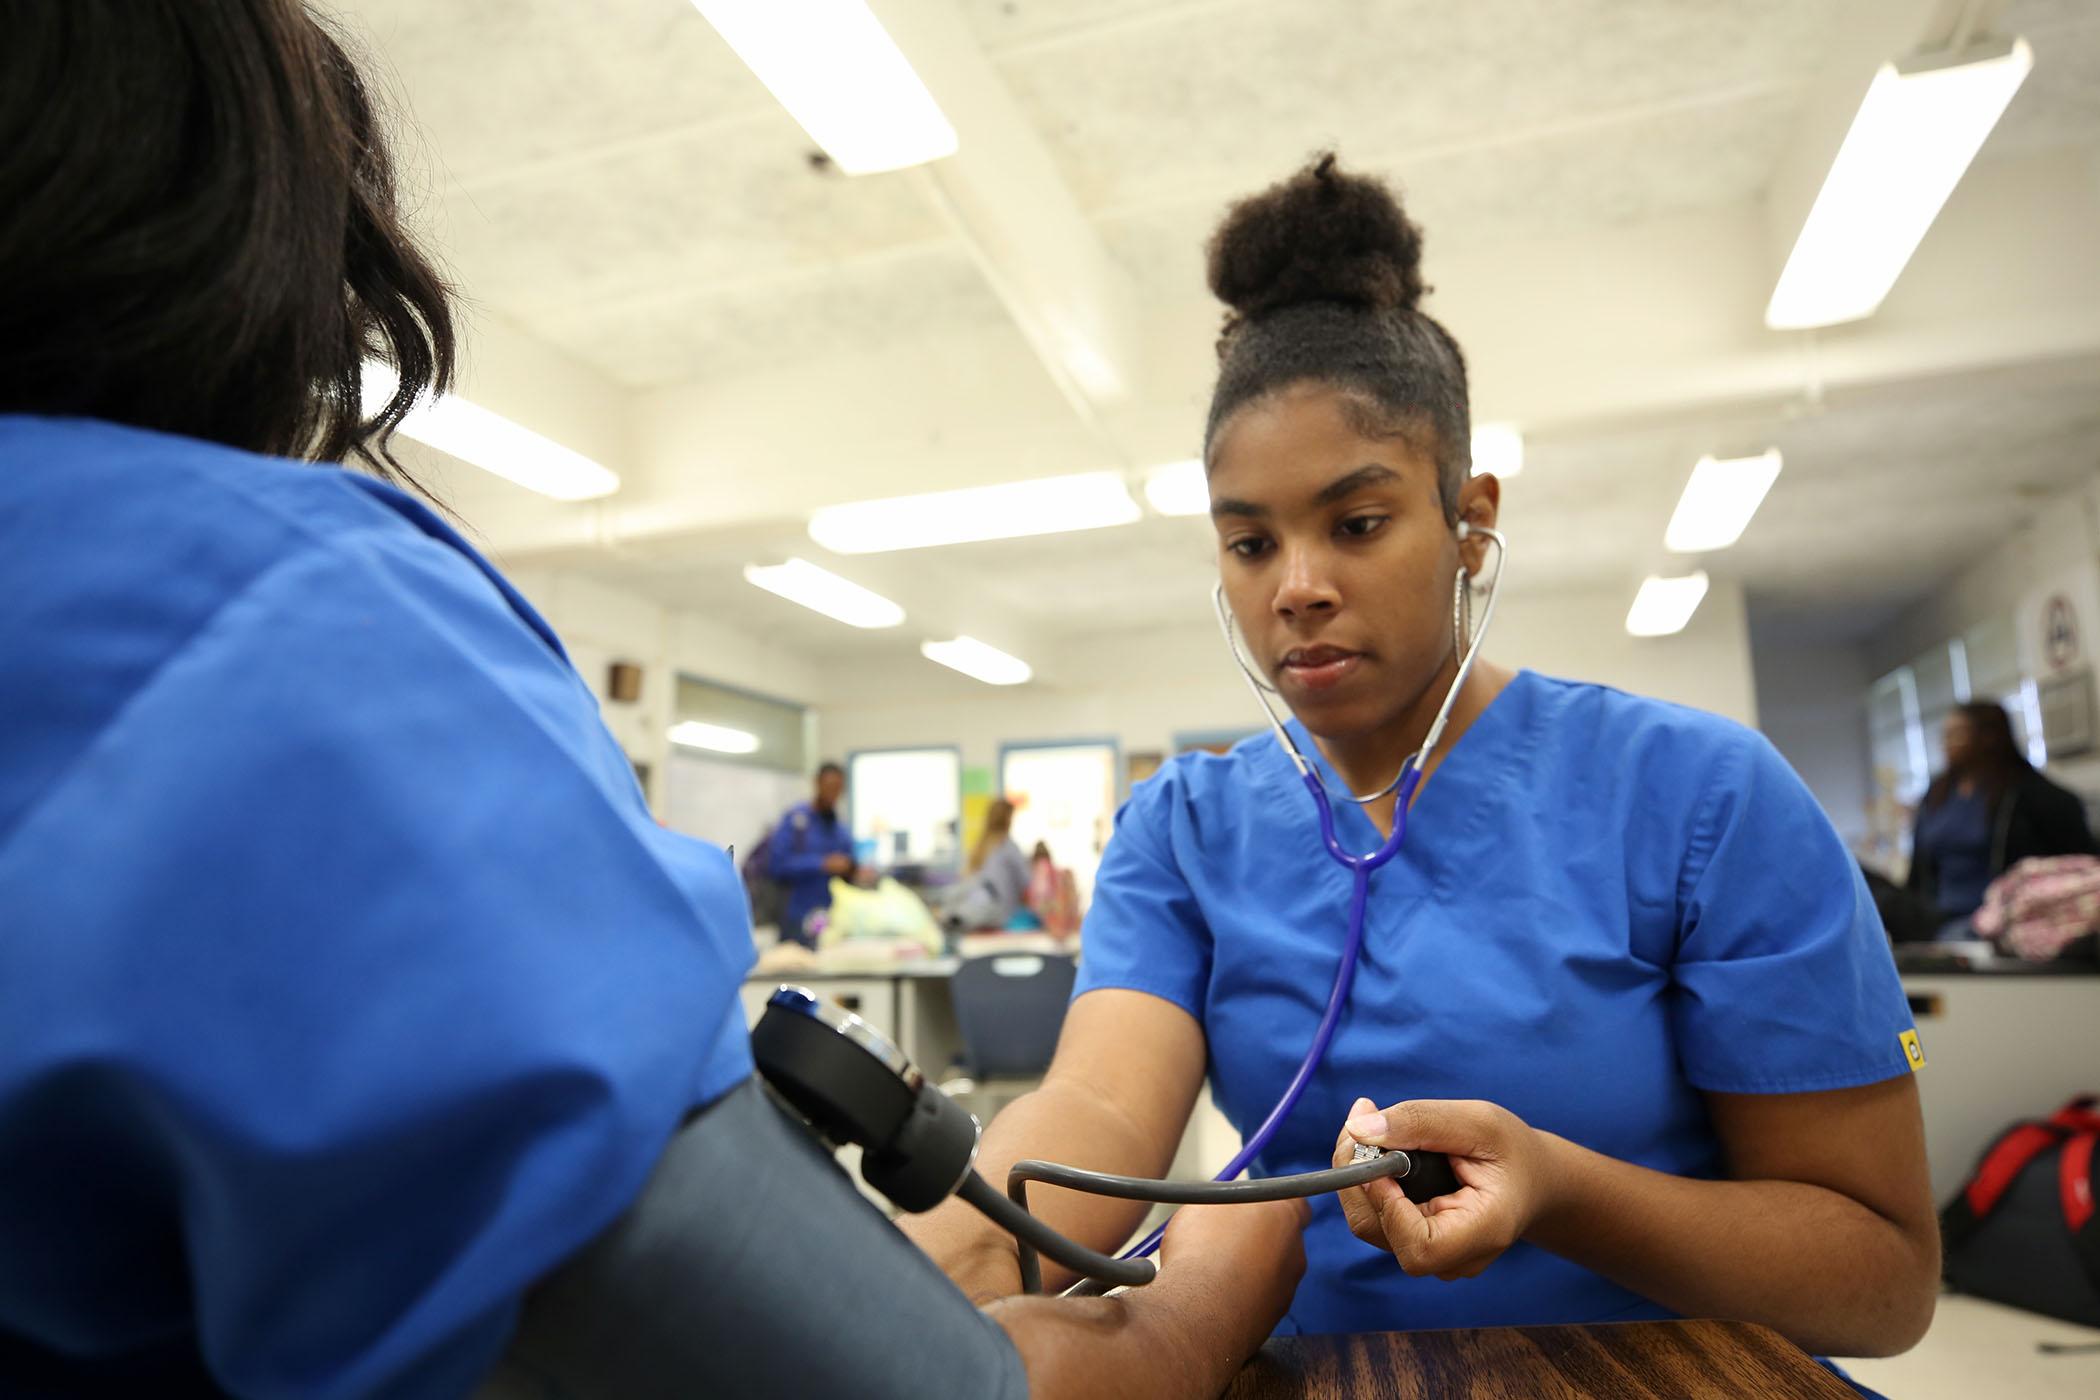 Sayjah checks a classmate's blood pressure during Health Science II.